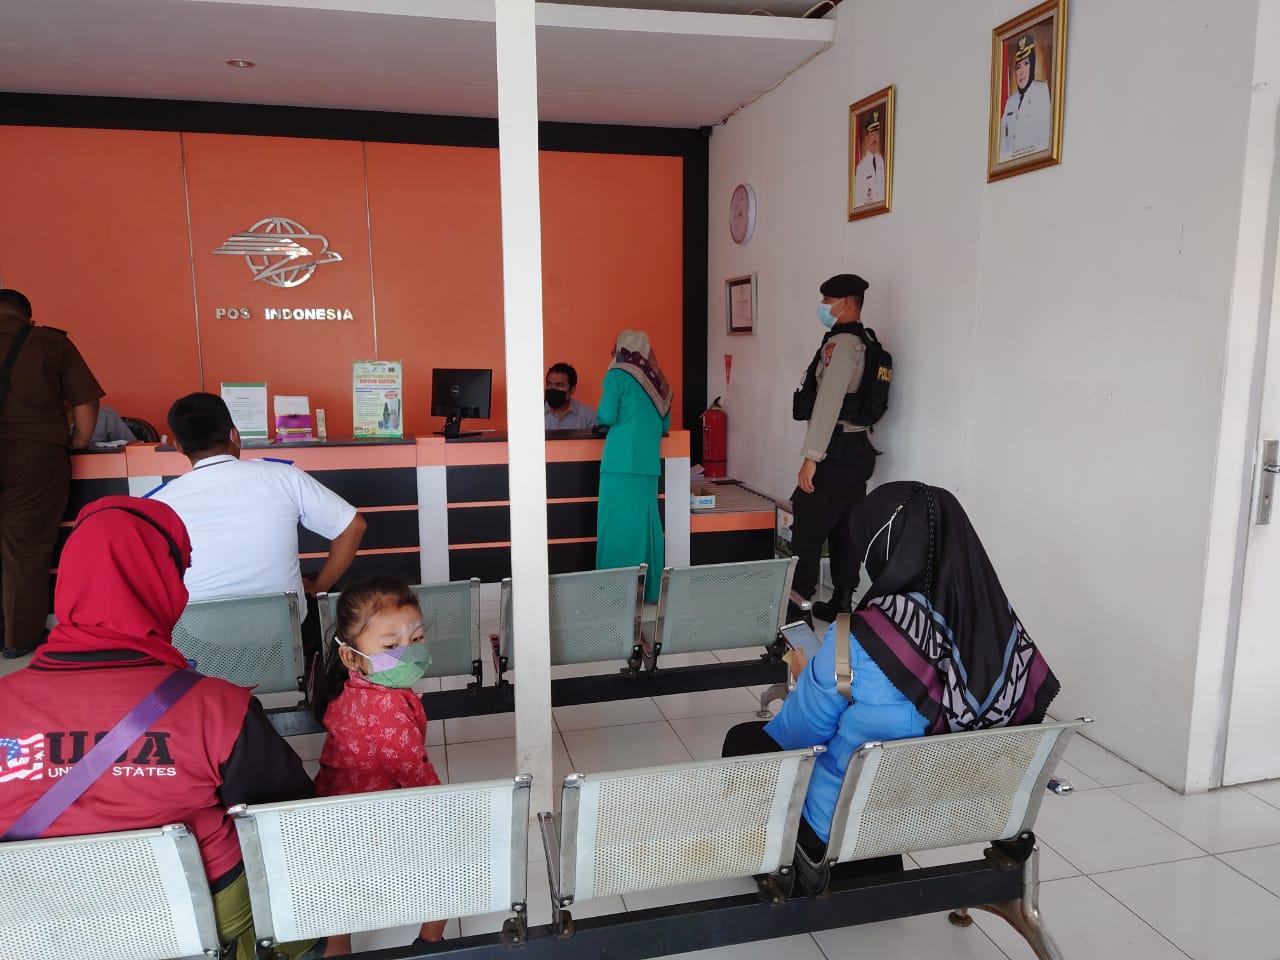 PS.KAURMINTU SAMAPTA POLRES SERUYAN DAN PS.KANIT PAMOBVIT POLRES SERUYAN SAMBANGI KANTOR POS INDONESIA YANG ADA DIKOTA KUALA PEMBUANG 1